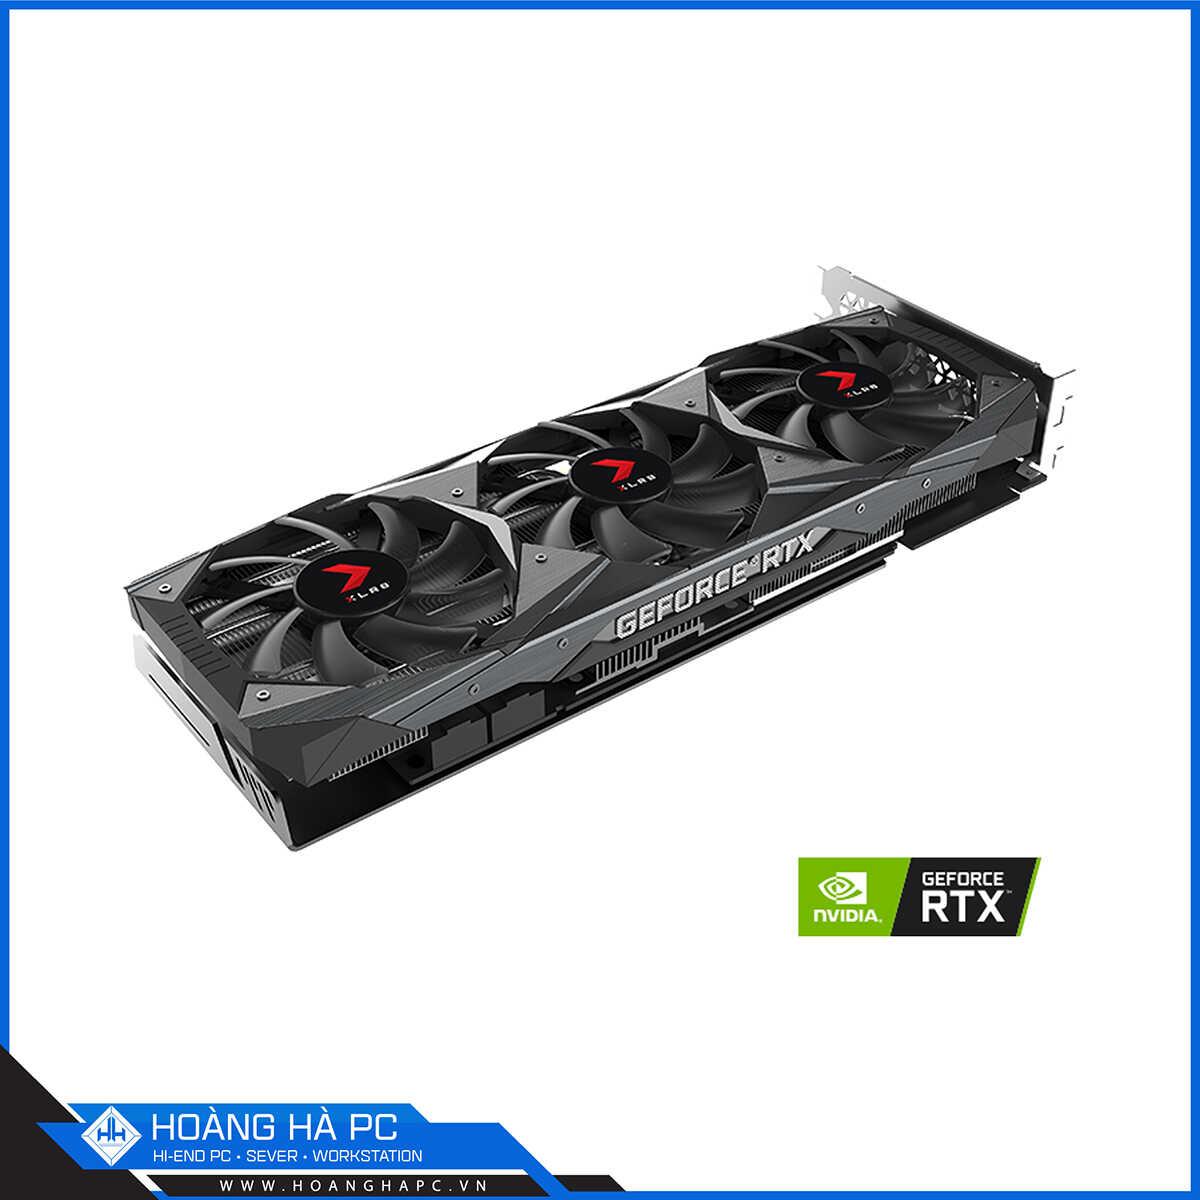 PNY GeForce RTX 2080 Super 8GB XLR8